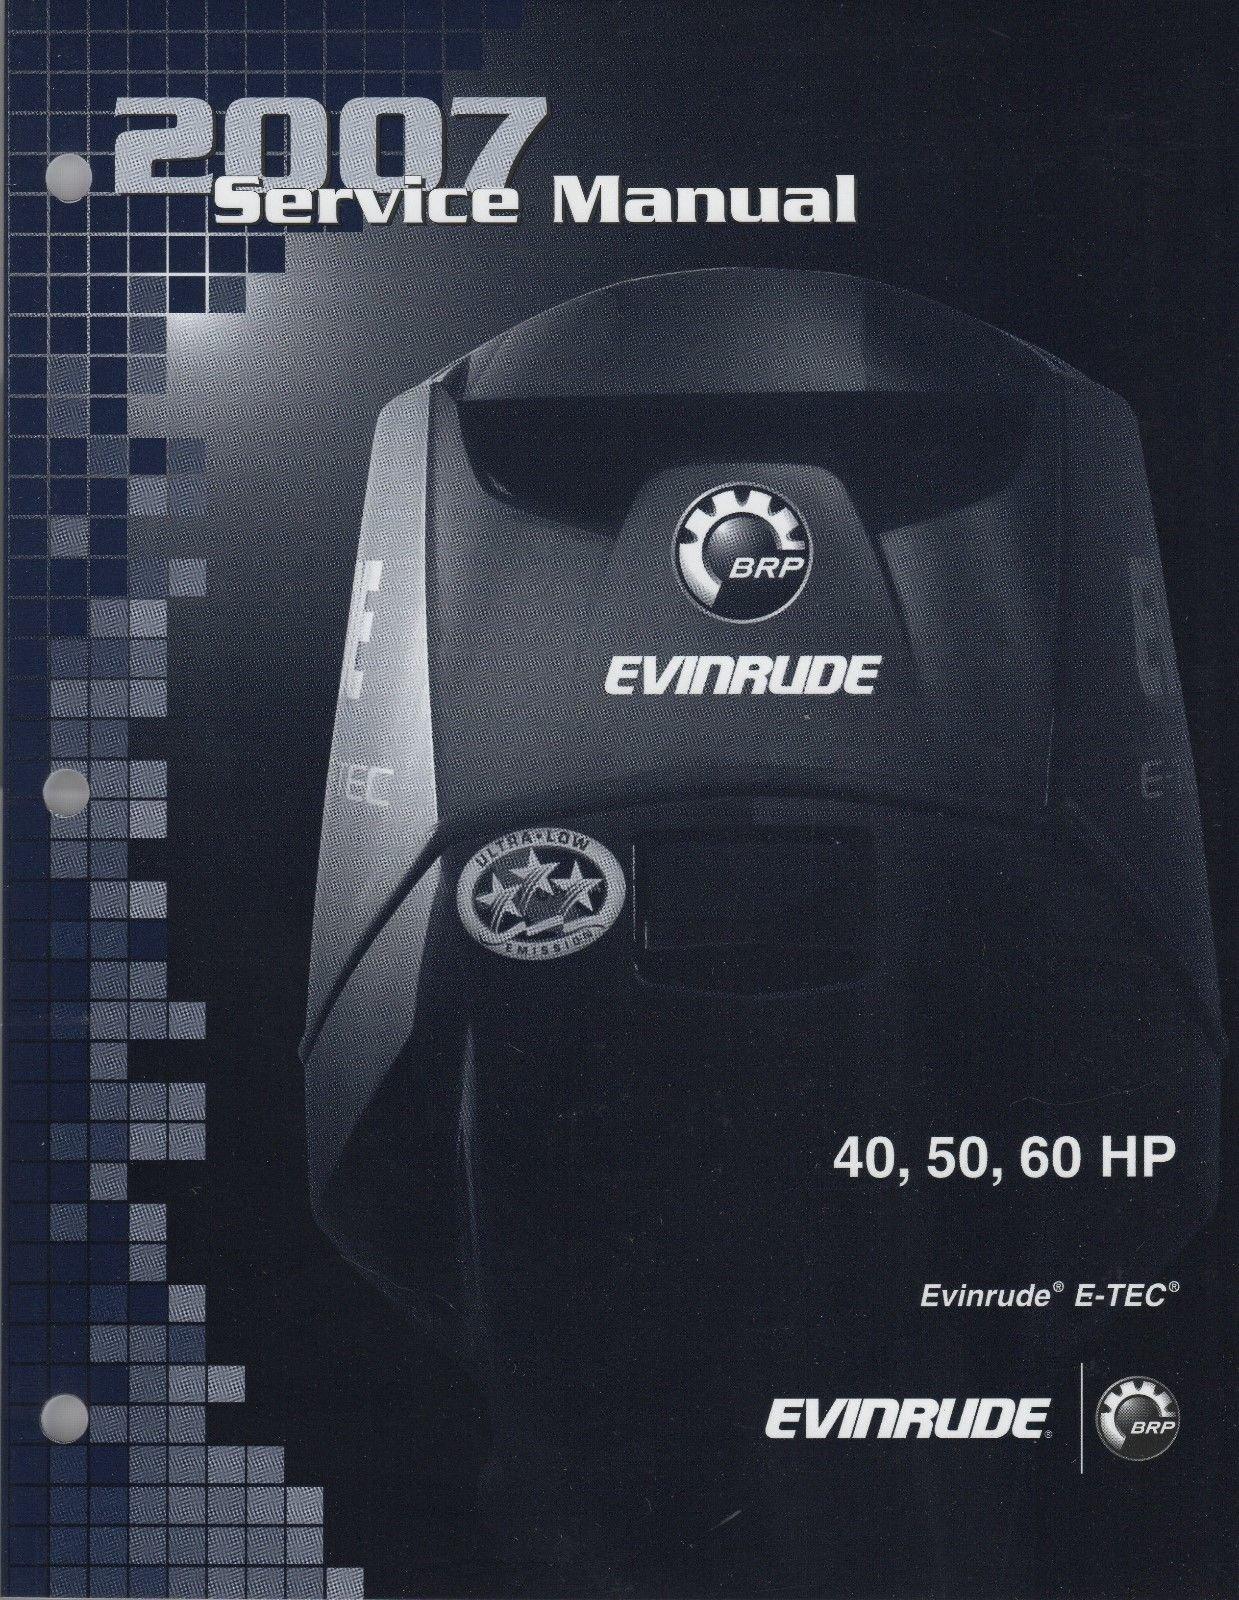 2007 EVINRUDE E-TEC OUTBOARD 40, 50, 60 HP SERVICE MANUAL (239): EVINRUDE:  Amazon.com: Books